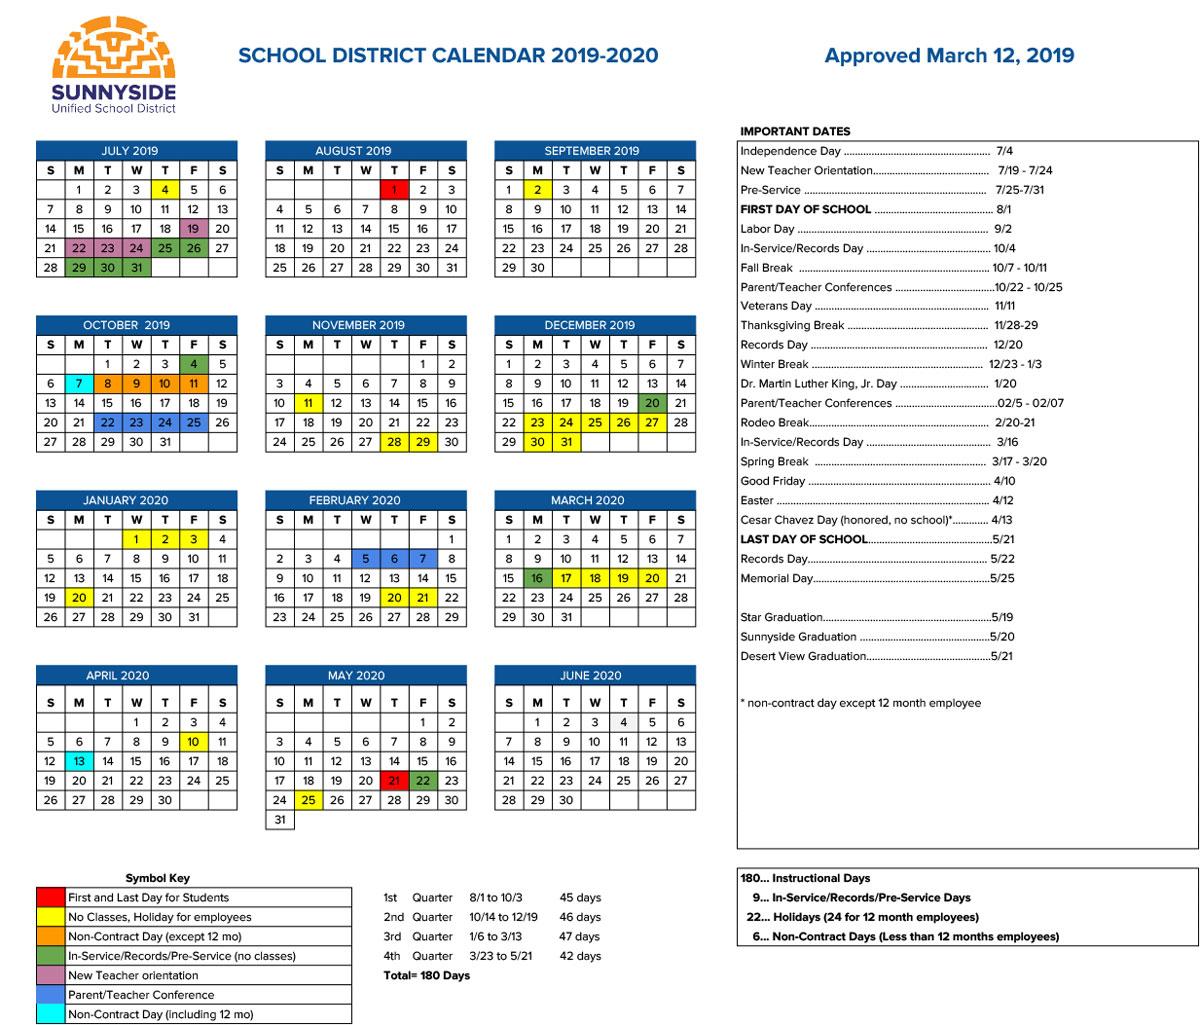 Academic Calendar | Sunnyside Unified School District regarding Berkeley Academic Calender